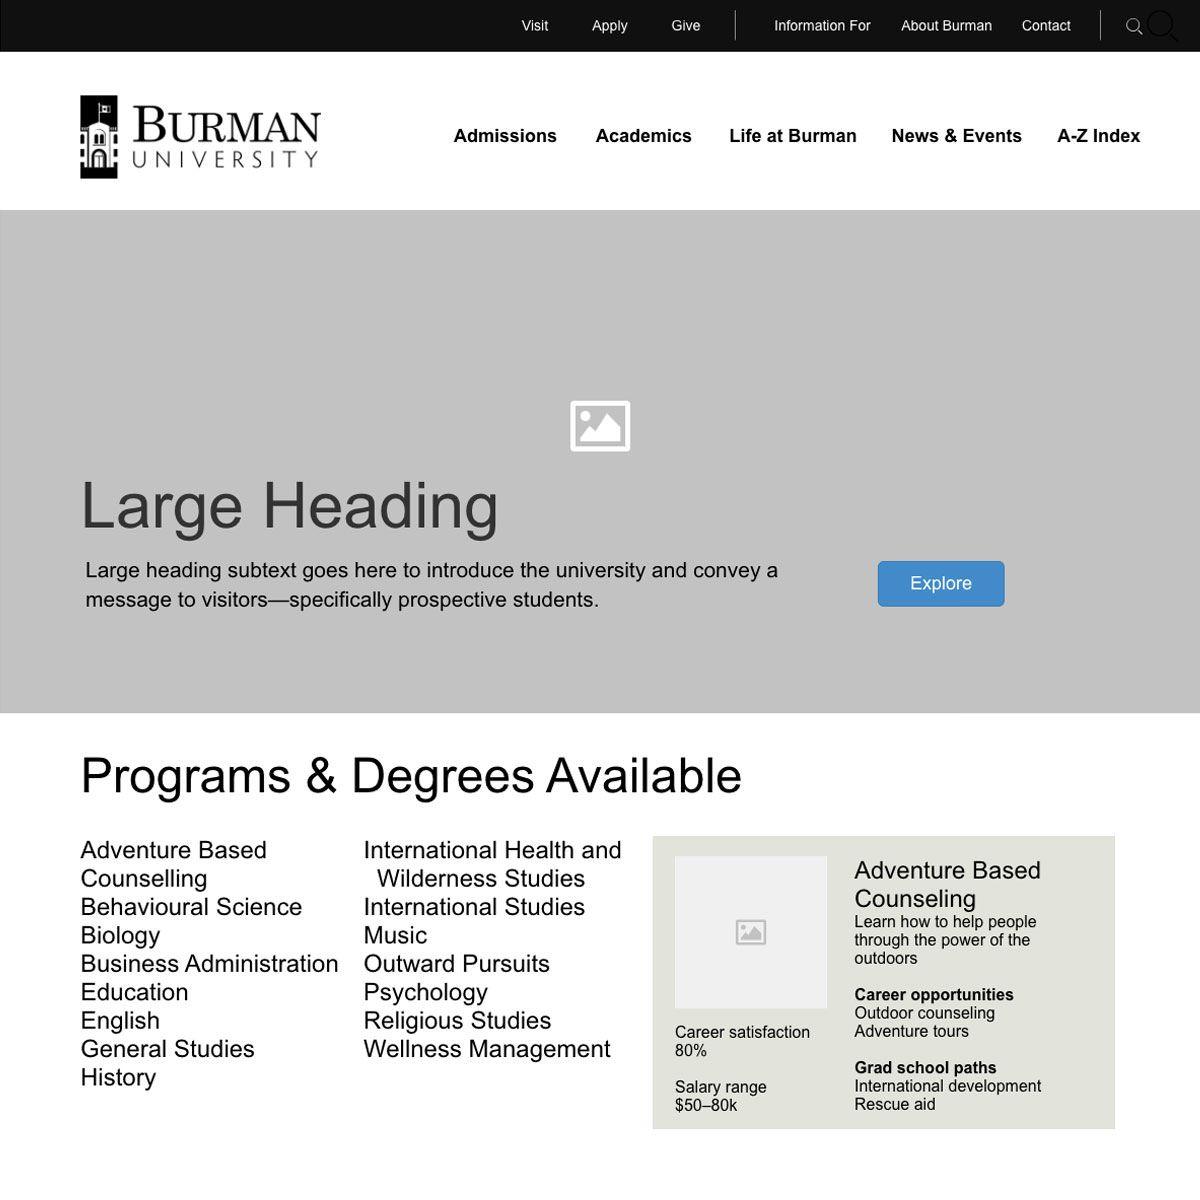 Burman University